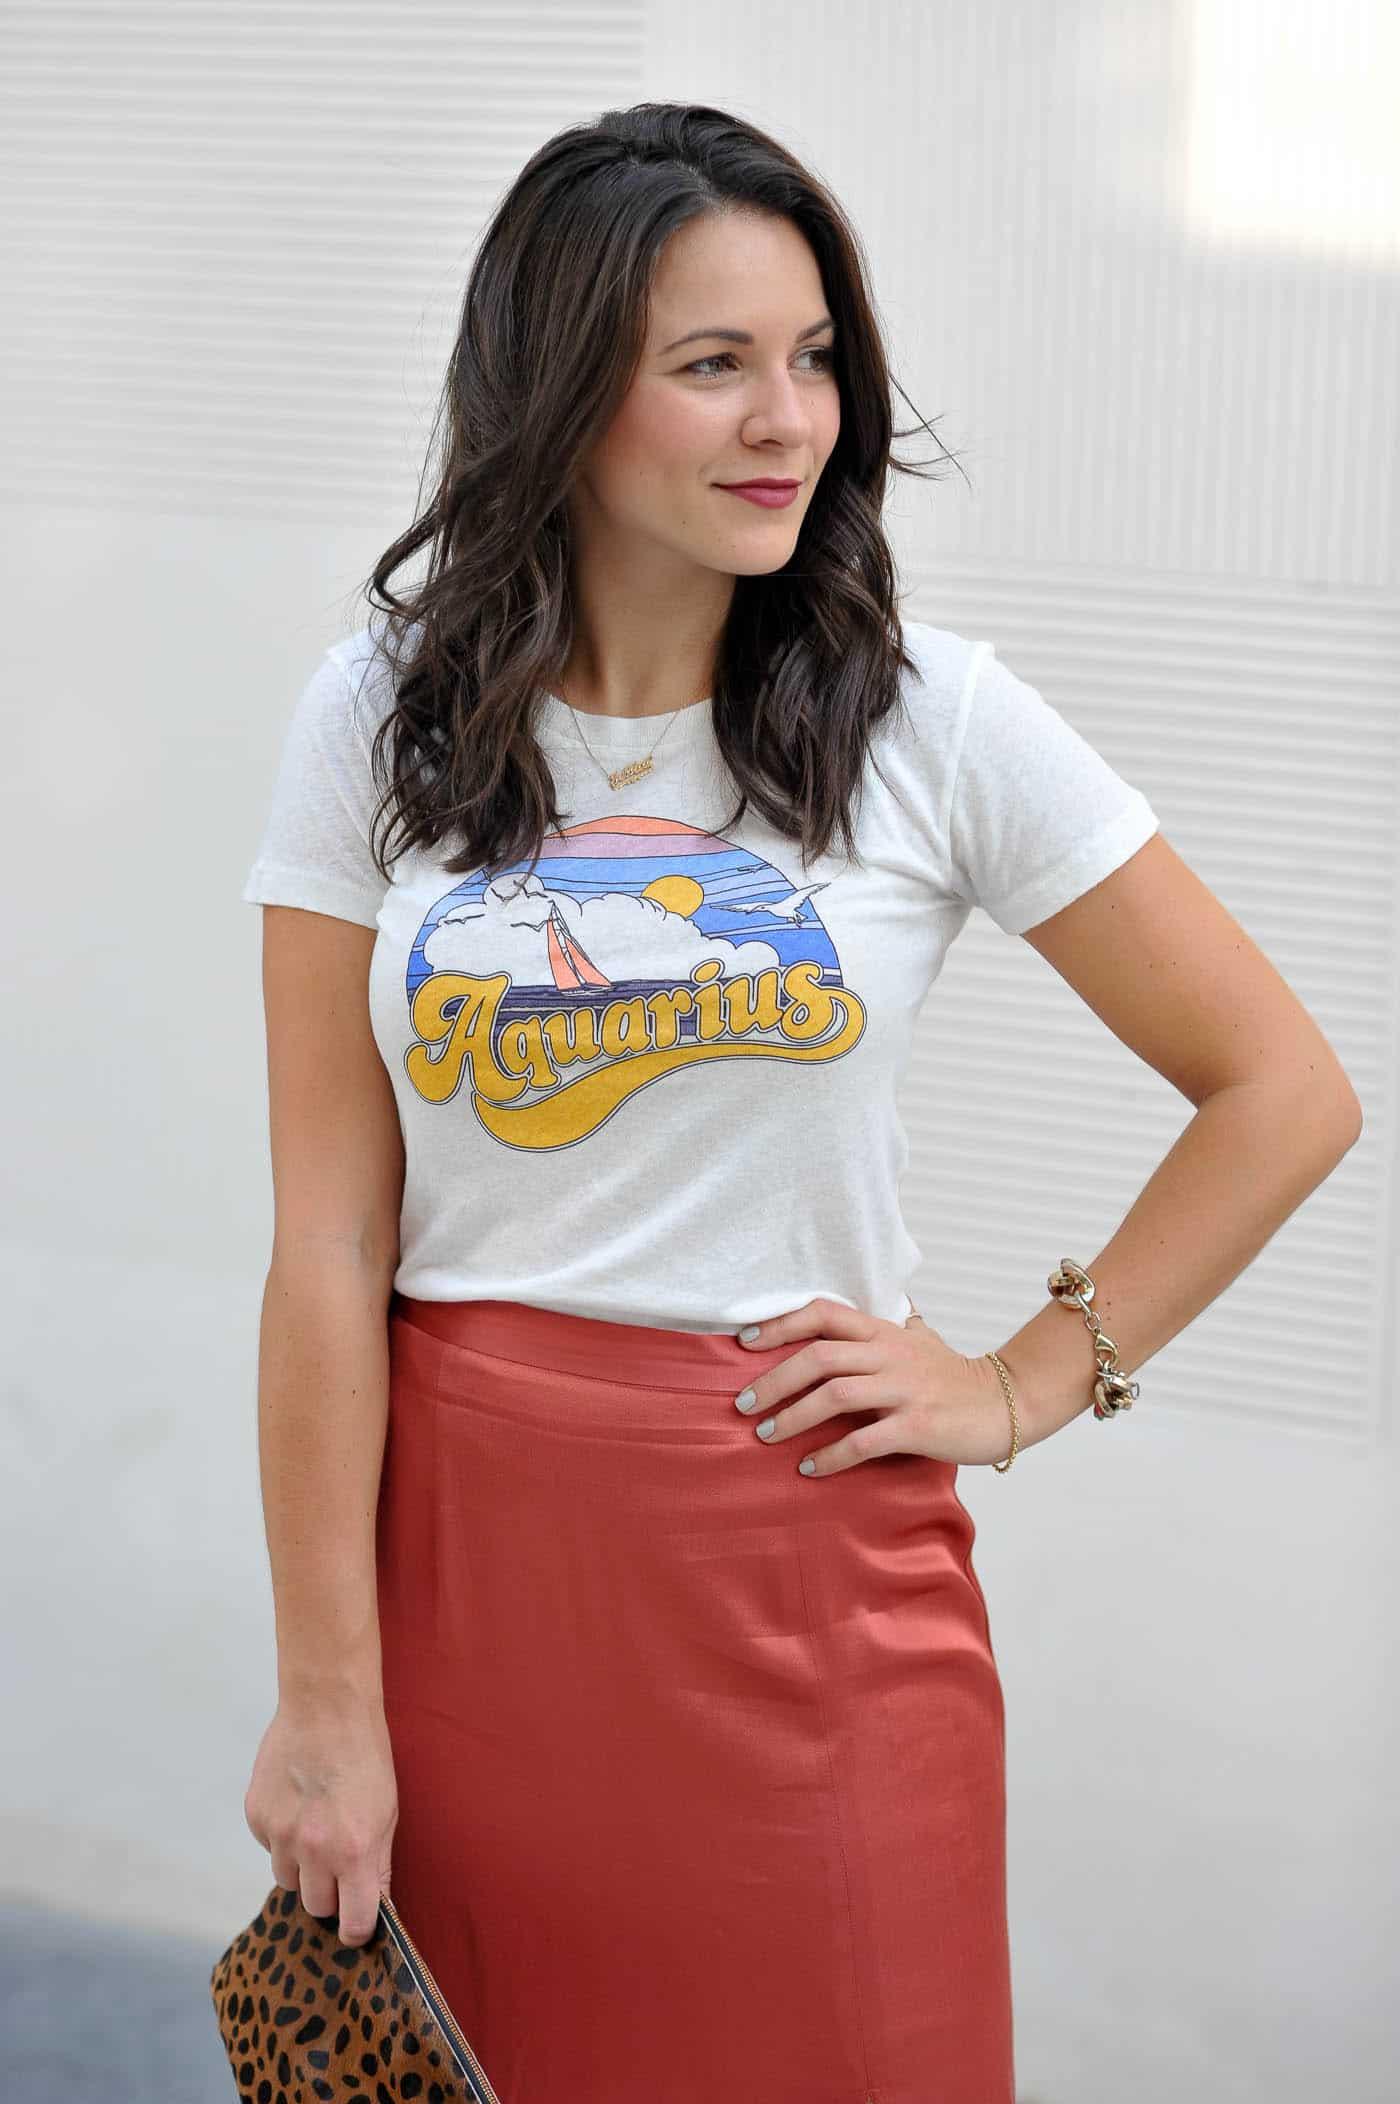 Aquarius Graphic Tee, zodiac tee, how to style a silk midi skirt - My Style Vita @mystylevita